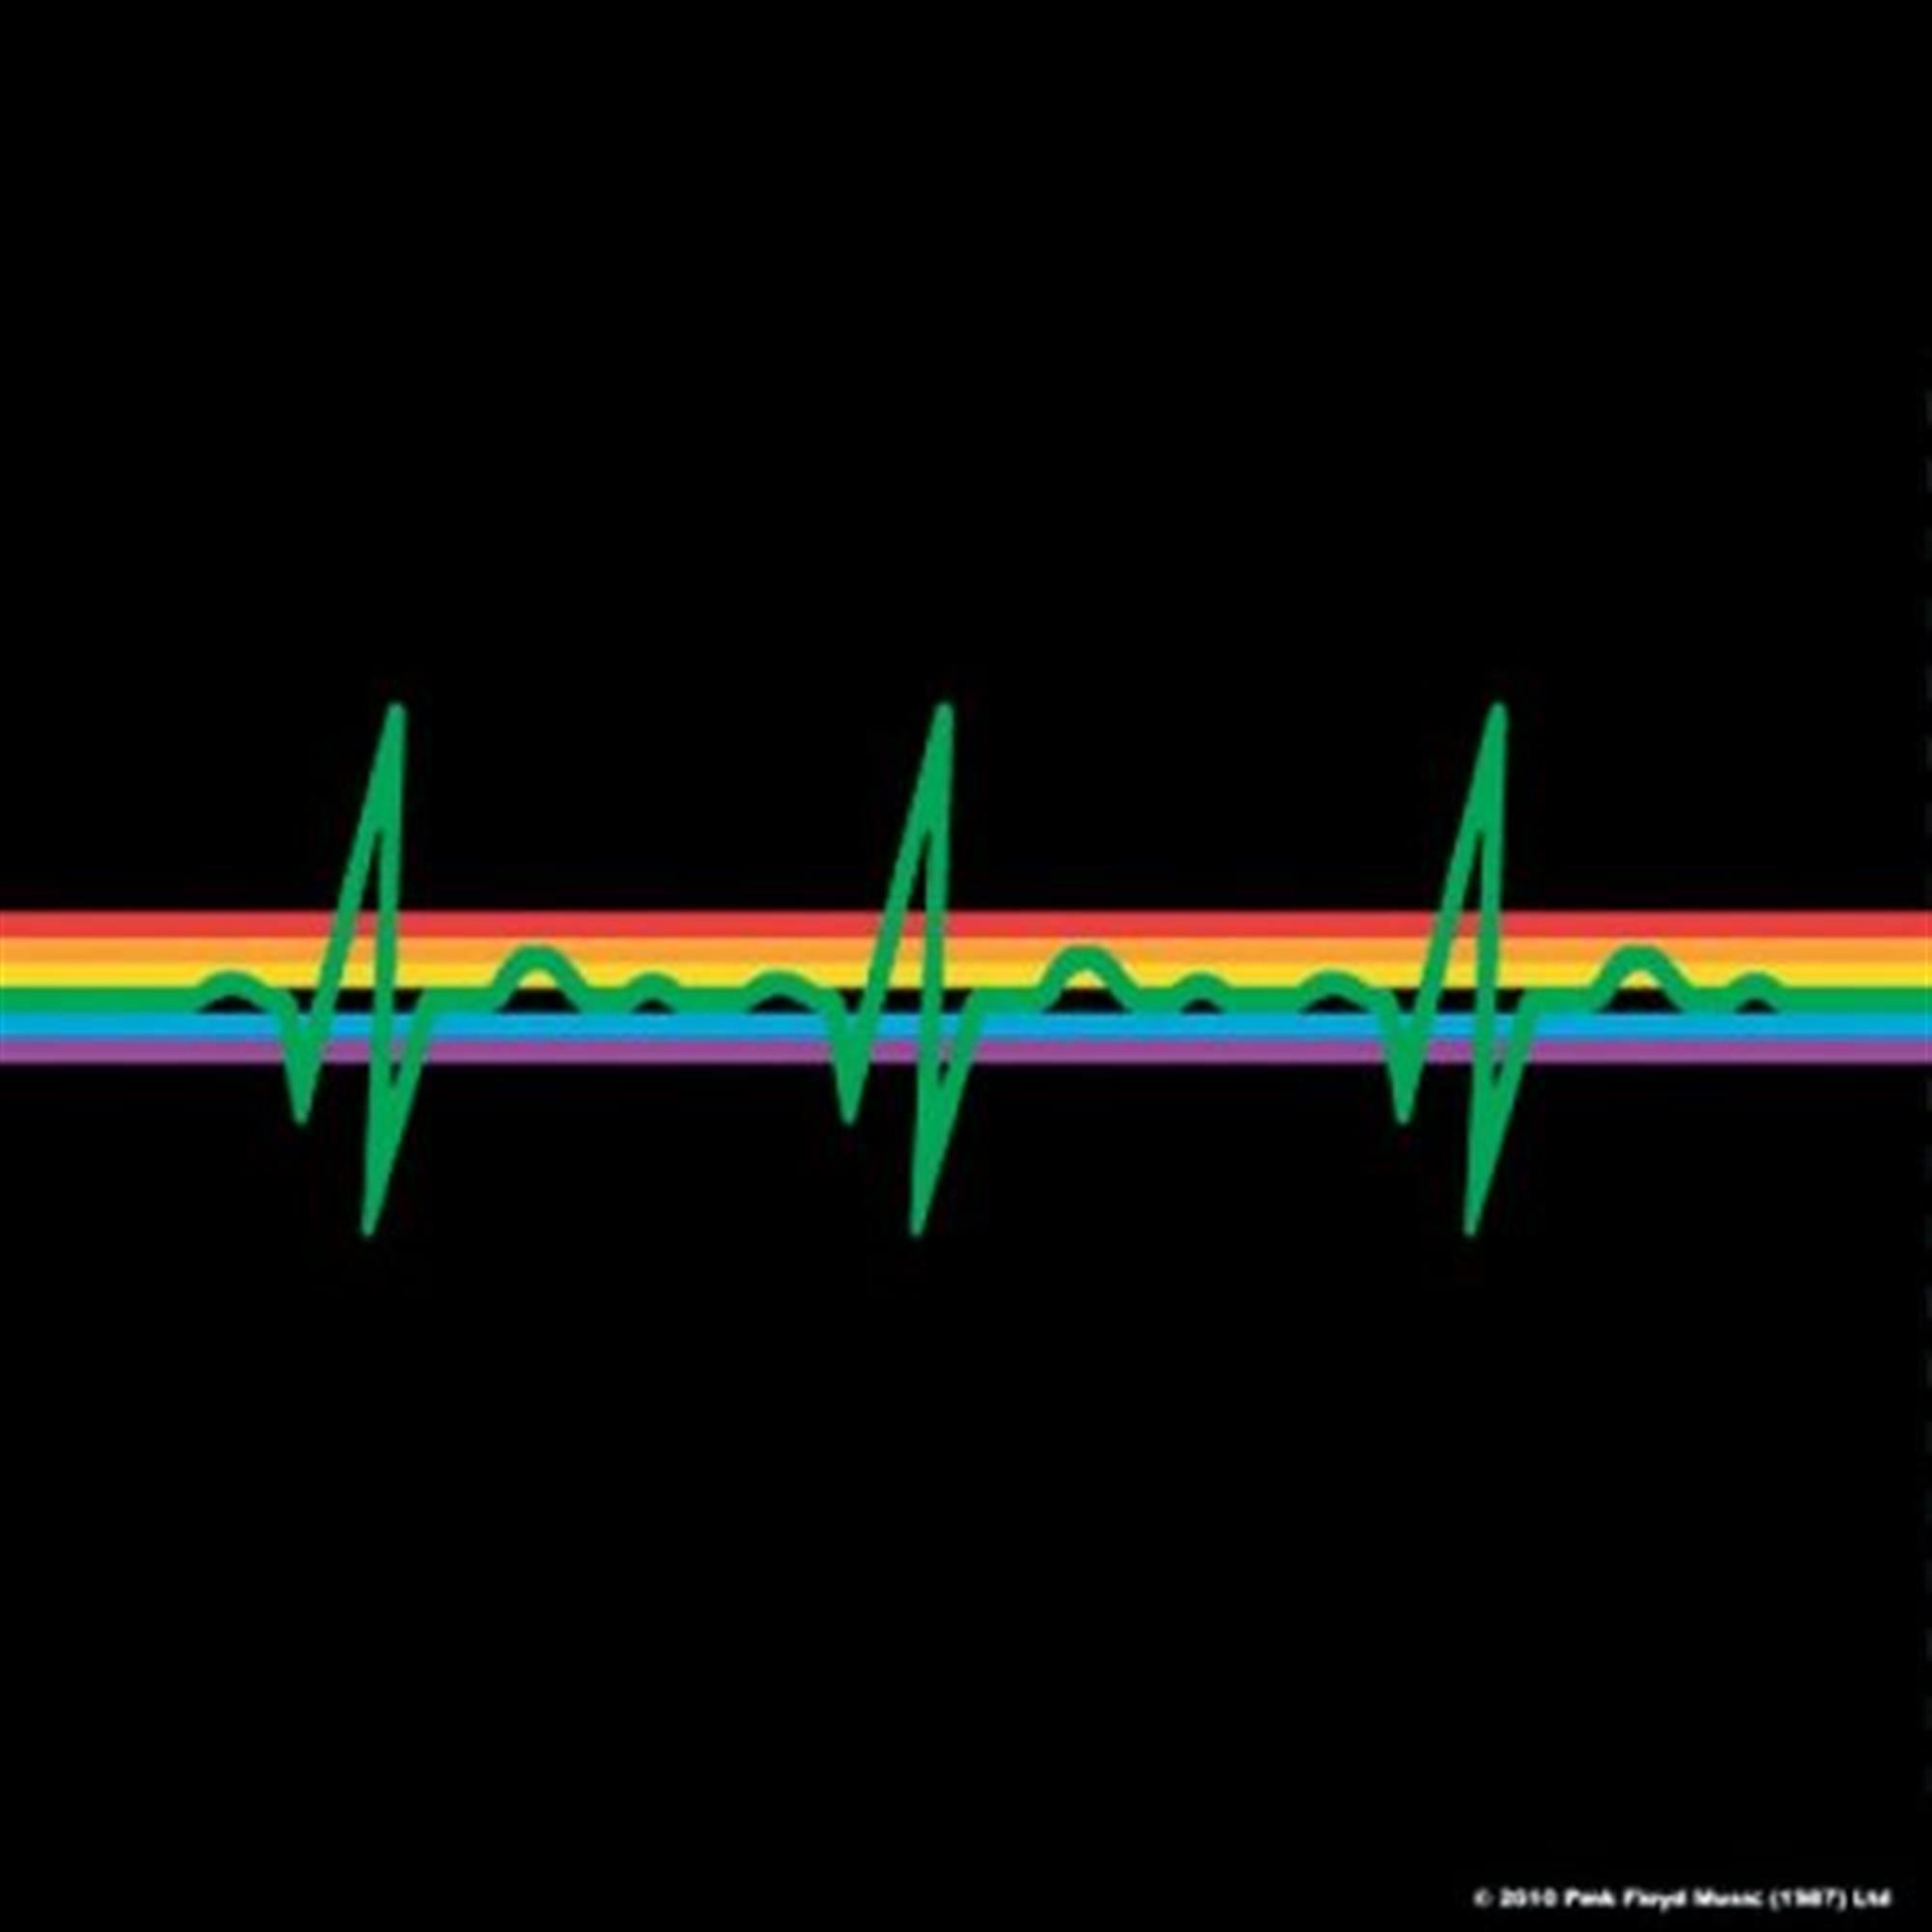 Rainbow Rate